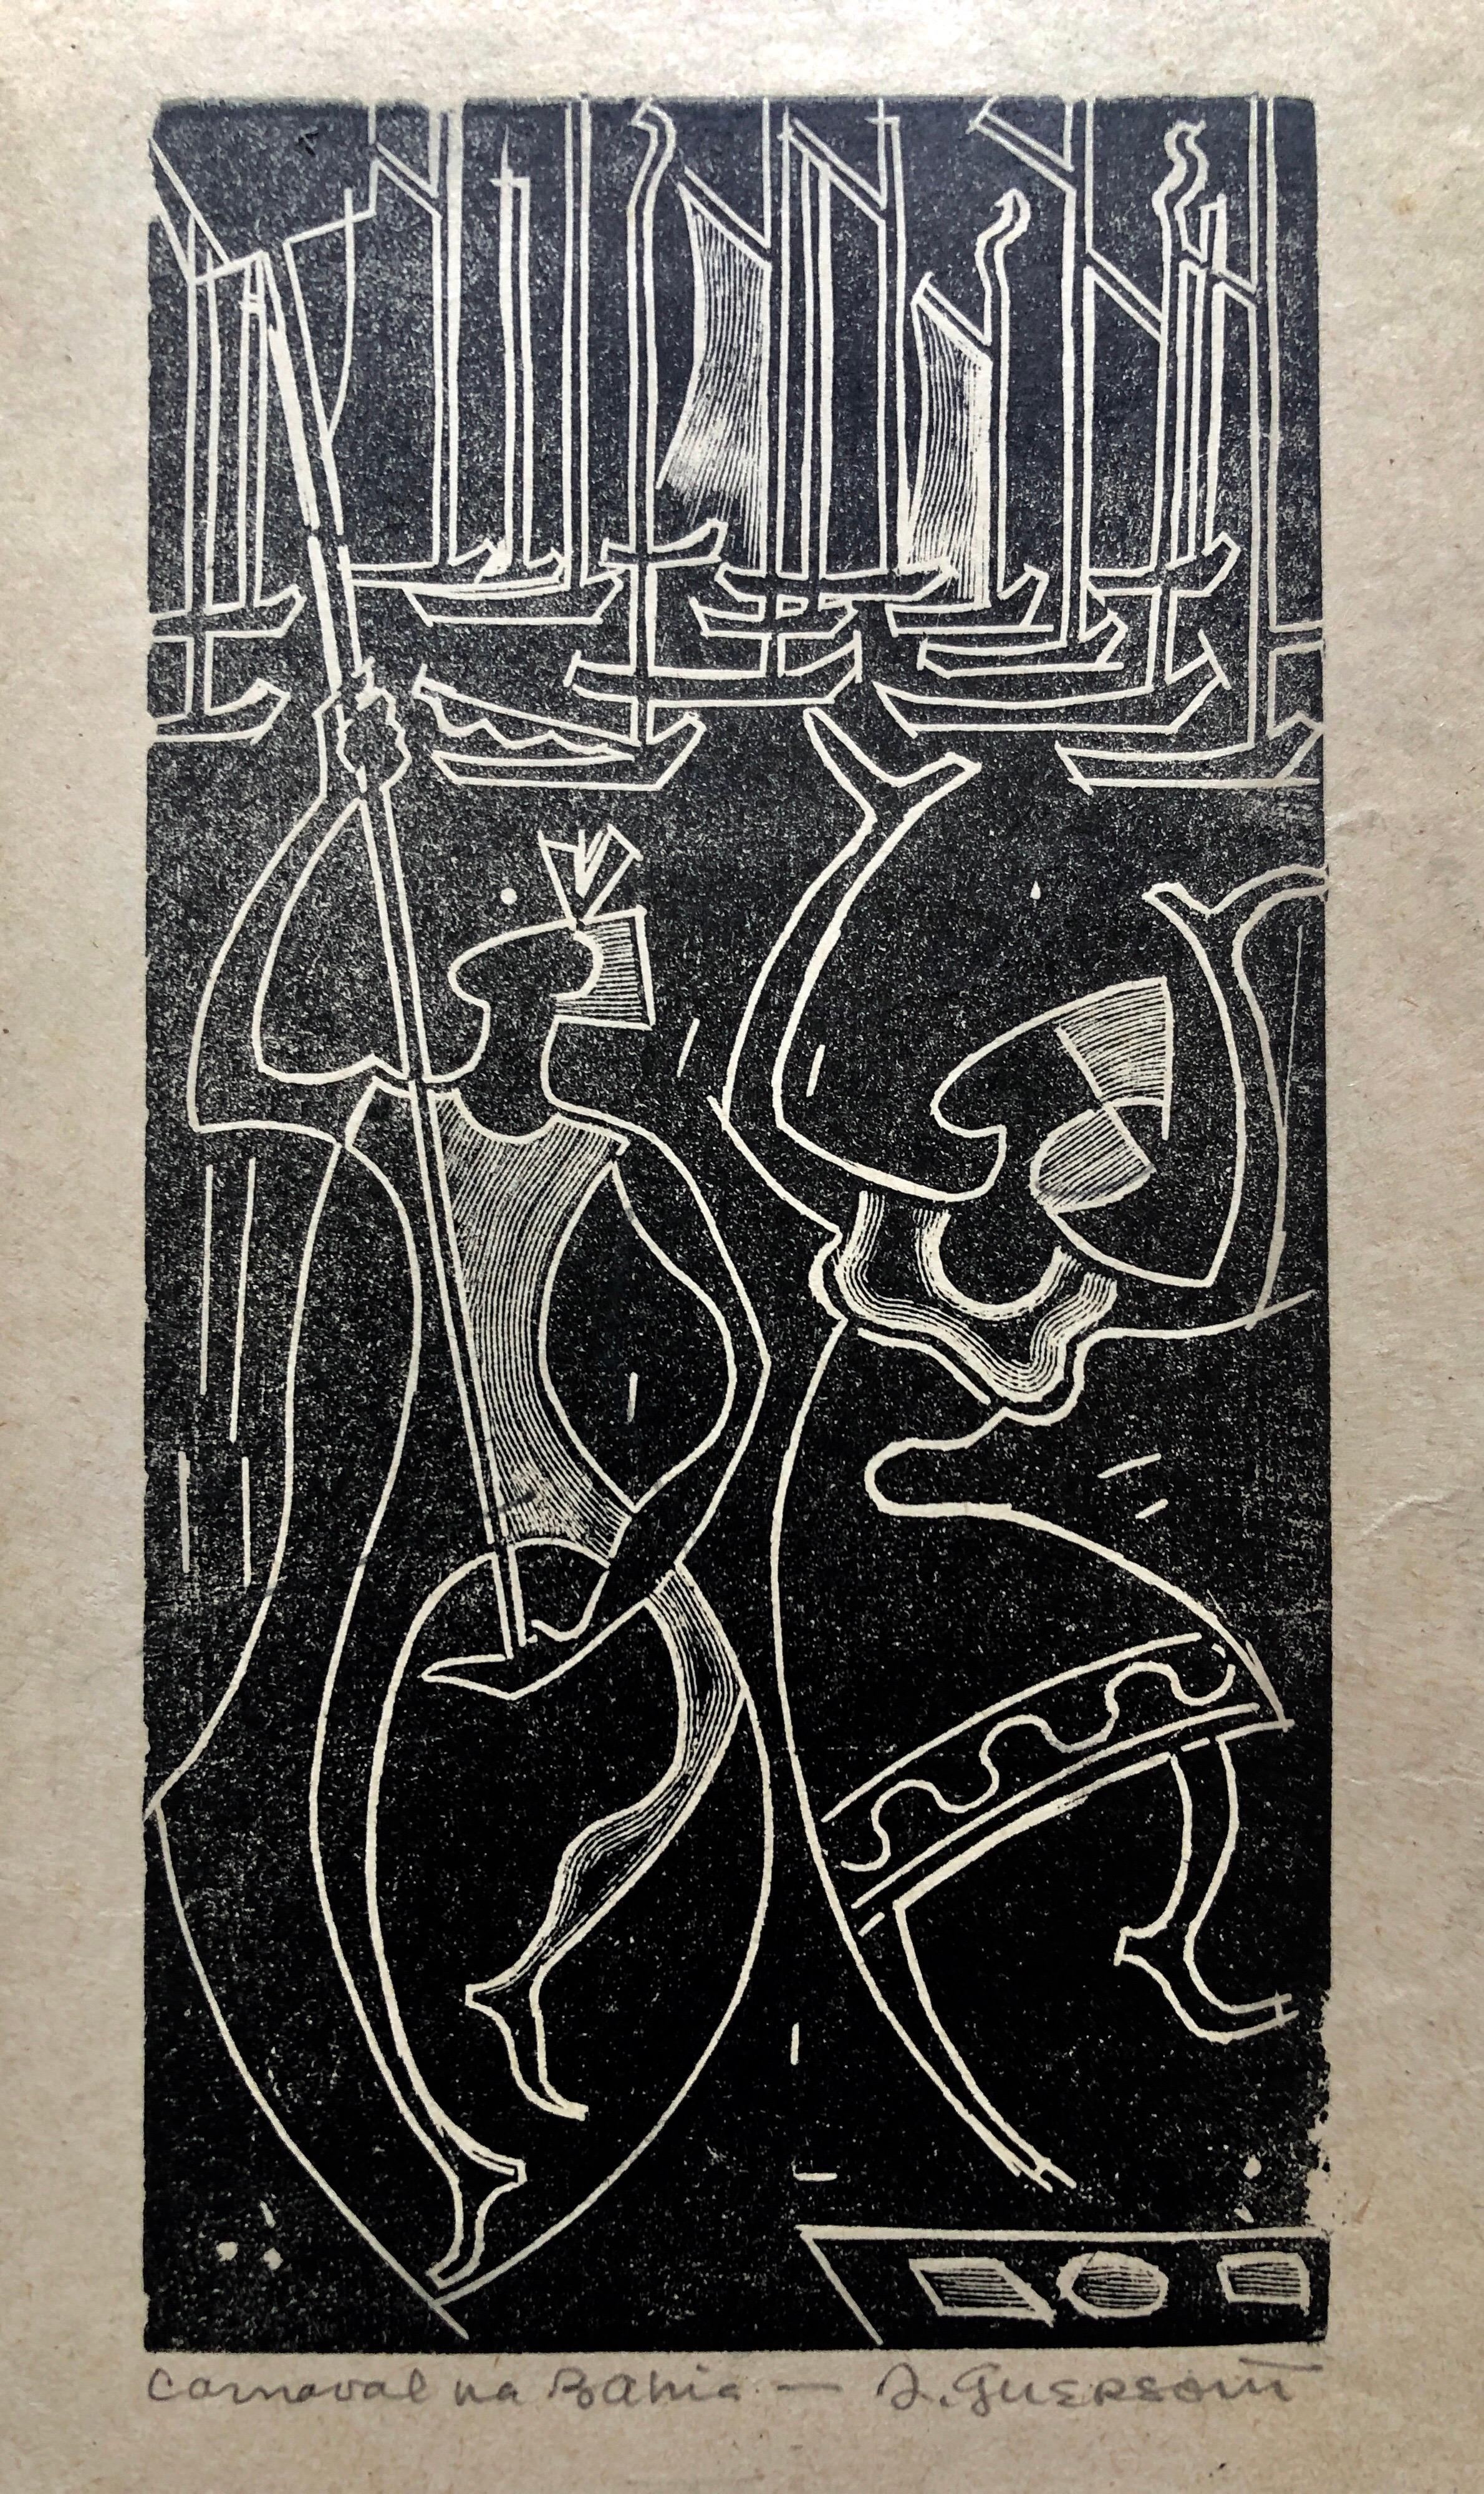 1945 Brazilian Master, Art Deco Nudes Serigraph Woodcut Carnaval Bahia